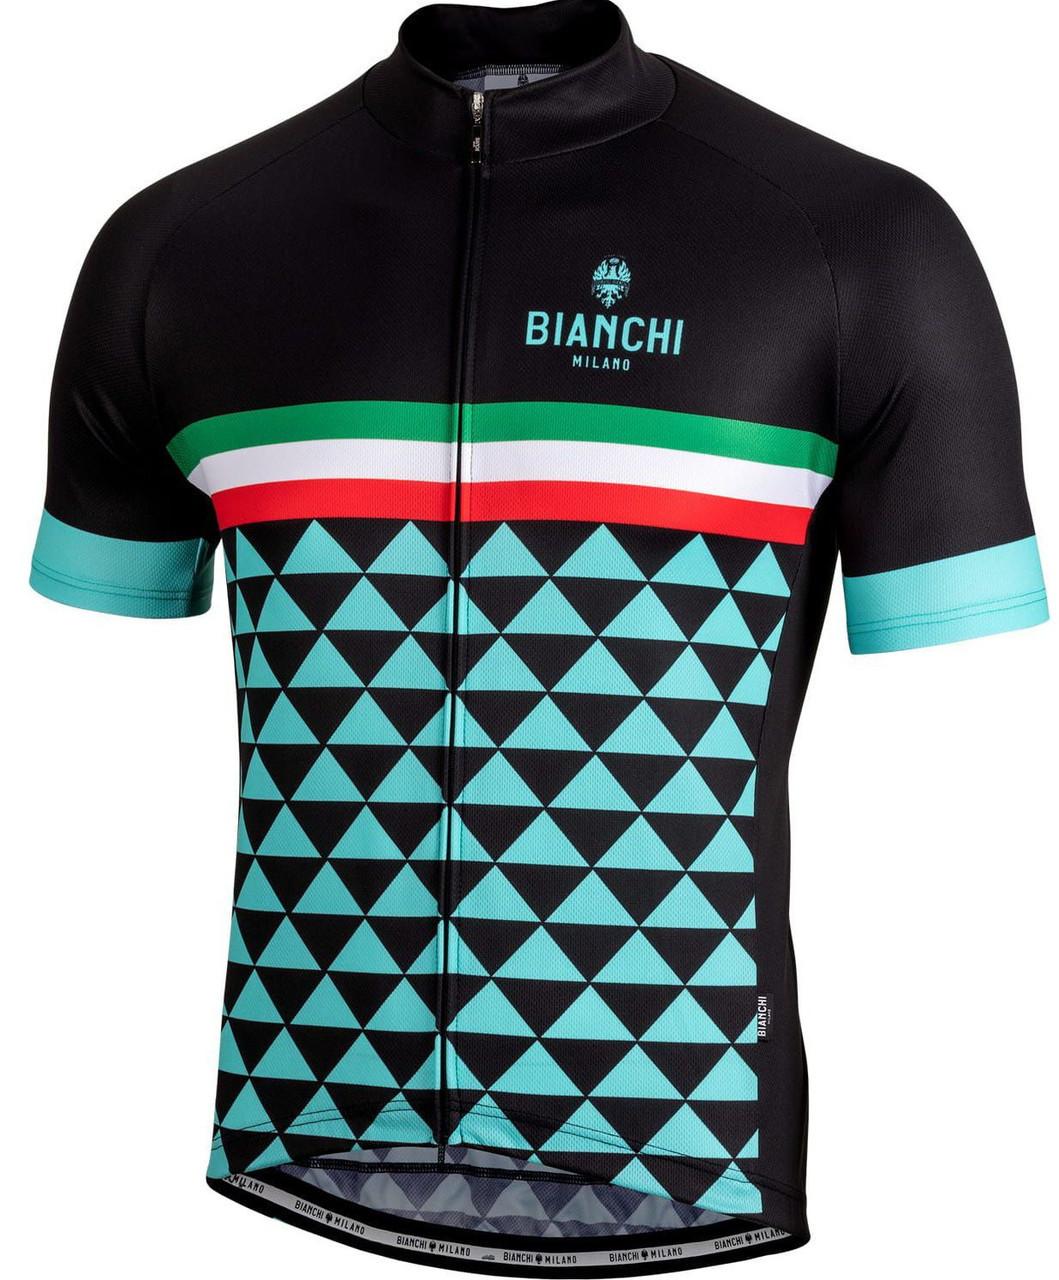 392173e8d0d Bianchi Milano Codigoro Black Jersey